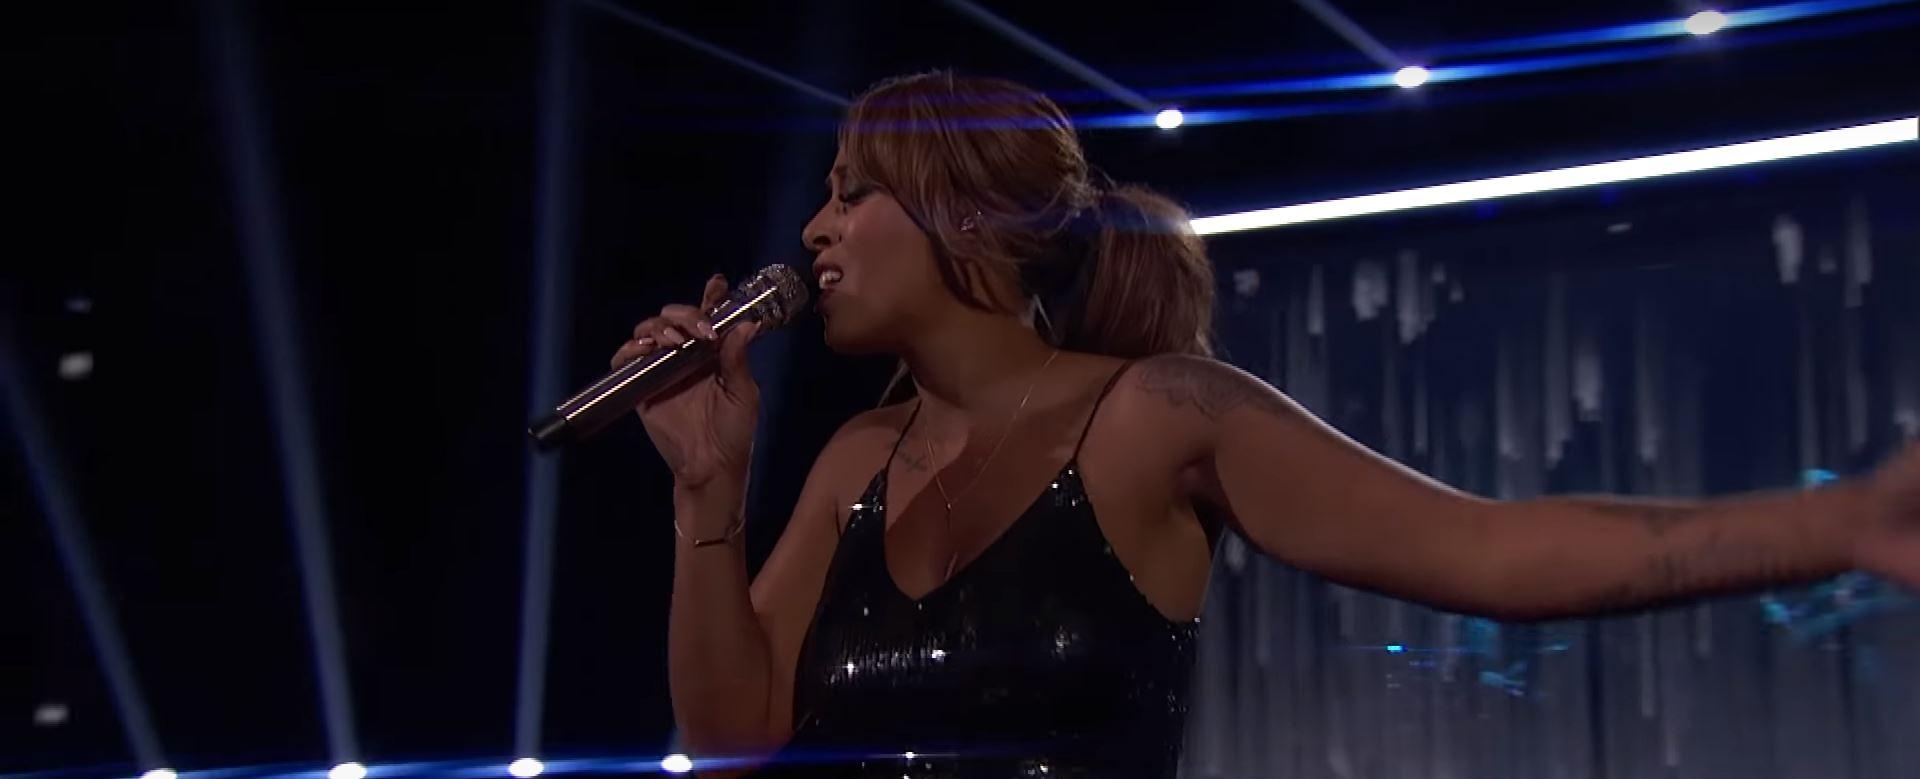 Glennis Grace to finale of America's Got Talent